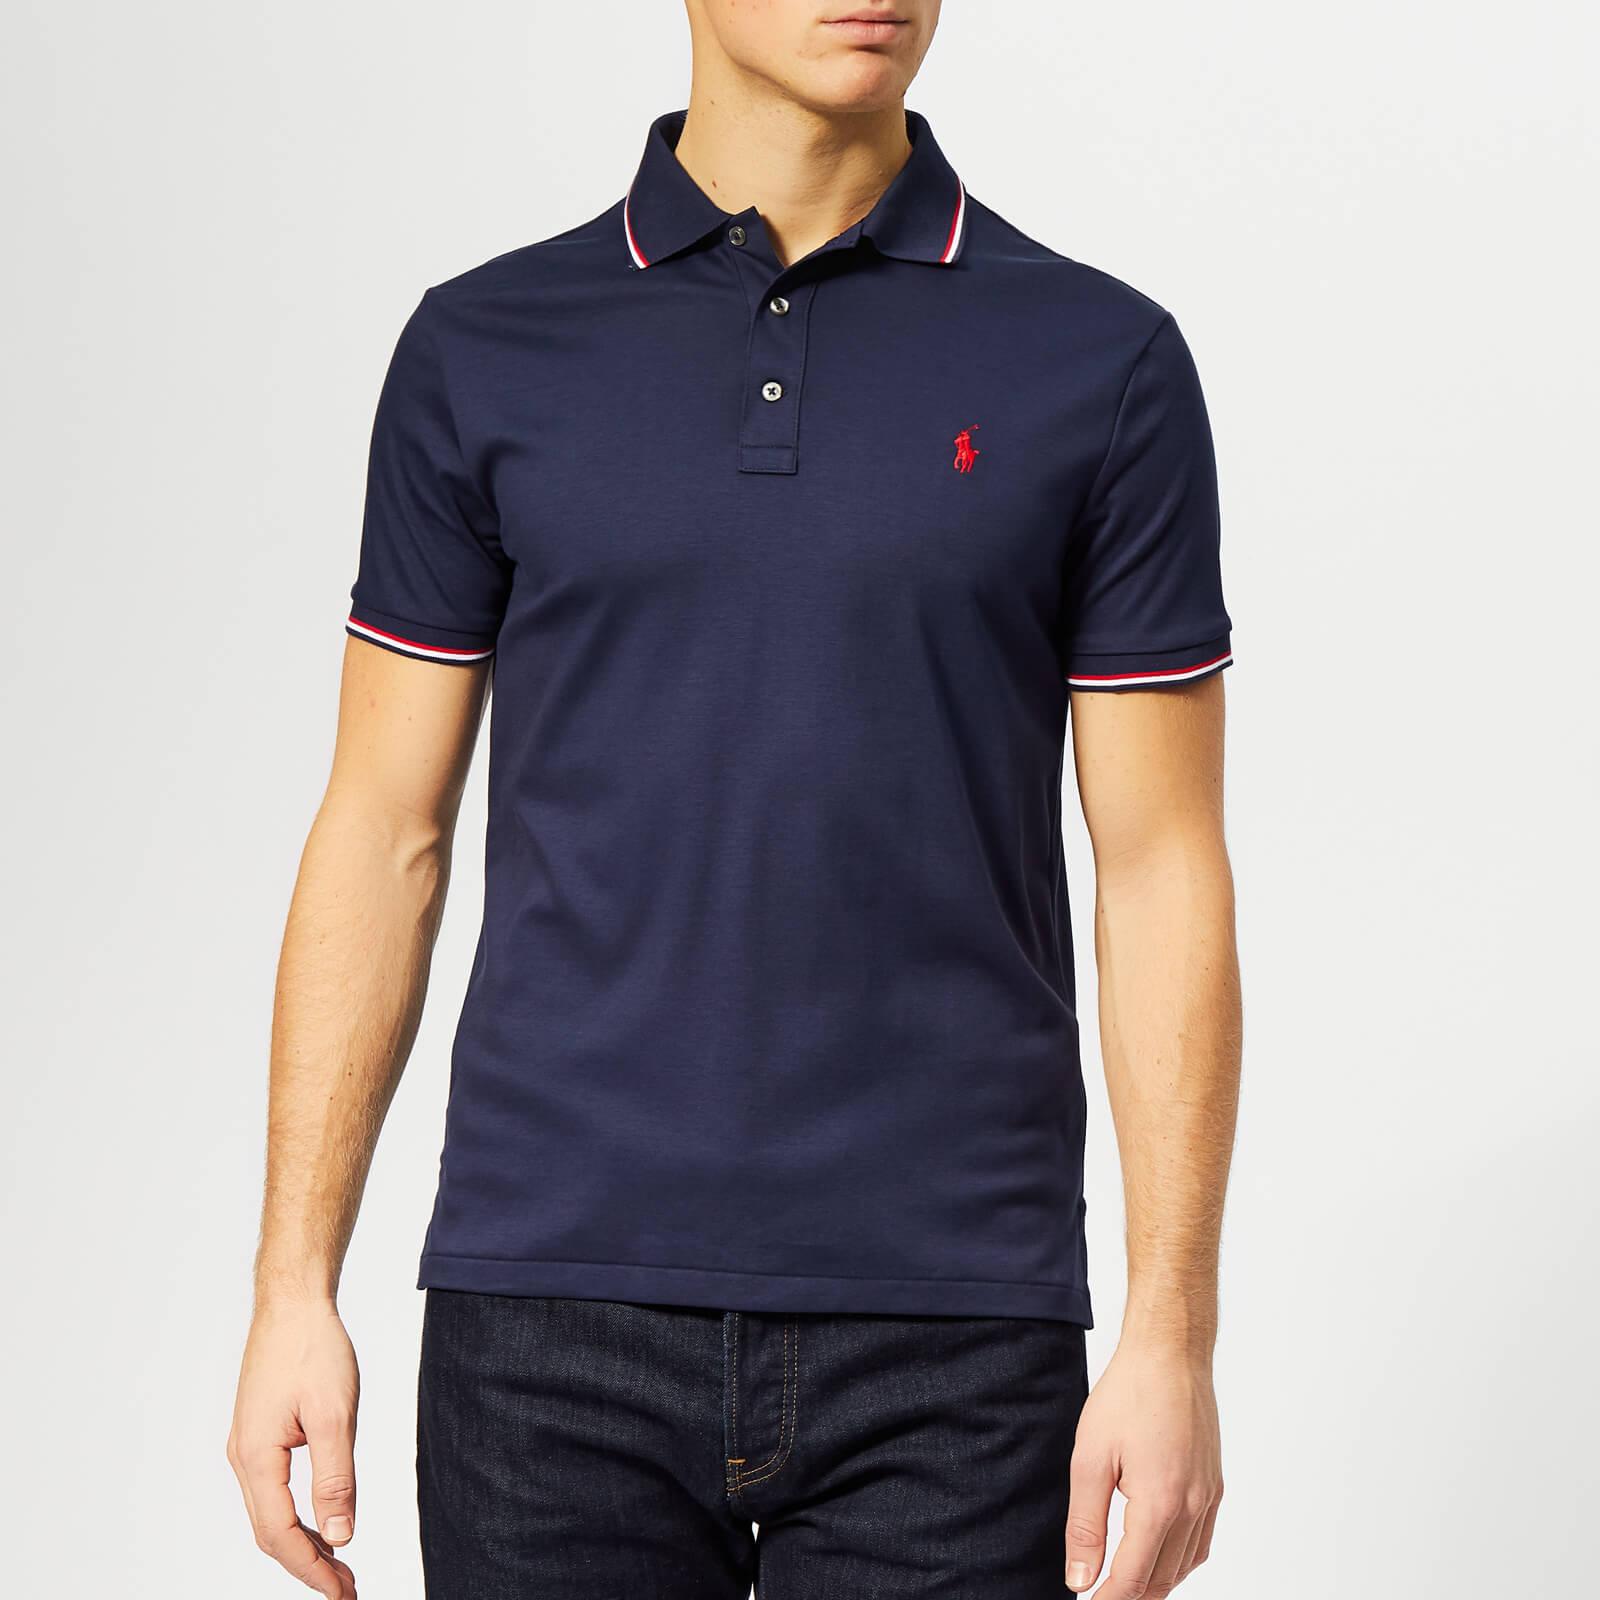 on sale e83ef 08bc7 Polo Ralph Lauren Men's Stripe Tipped Pima Polo Shirt - French Navy